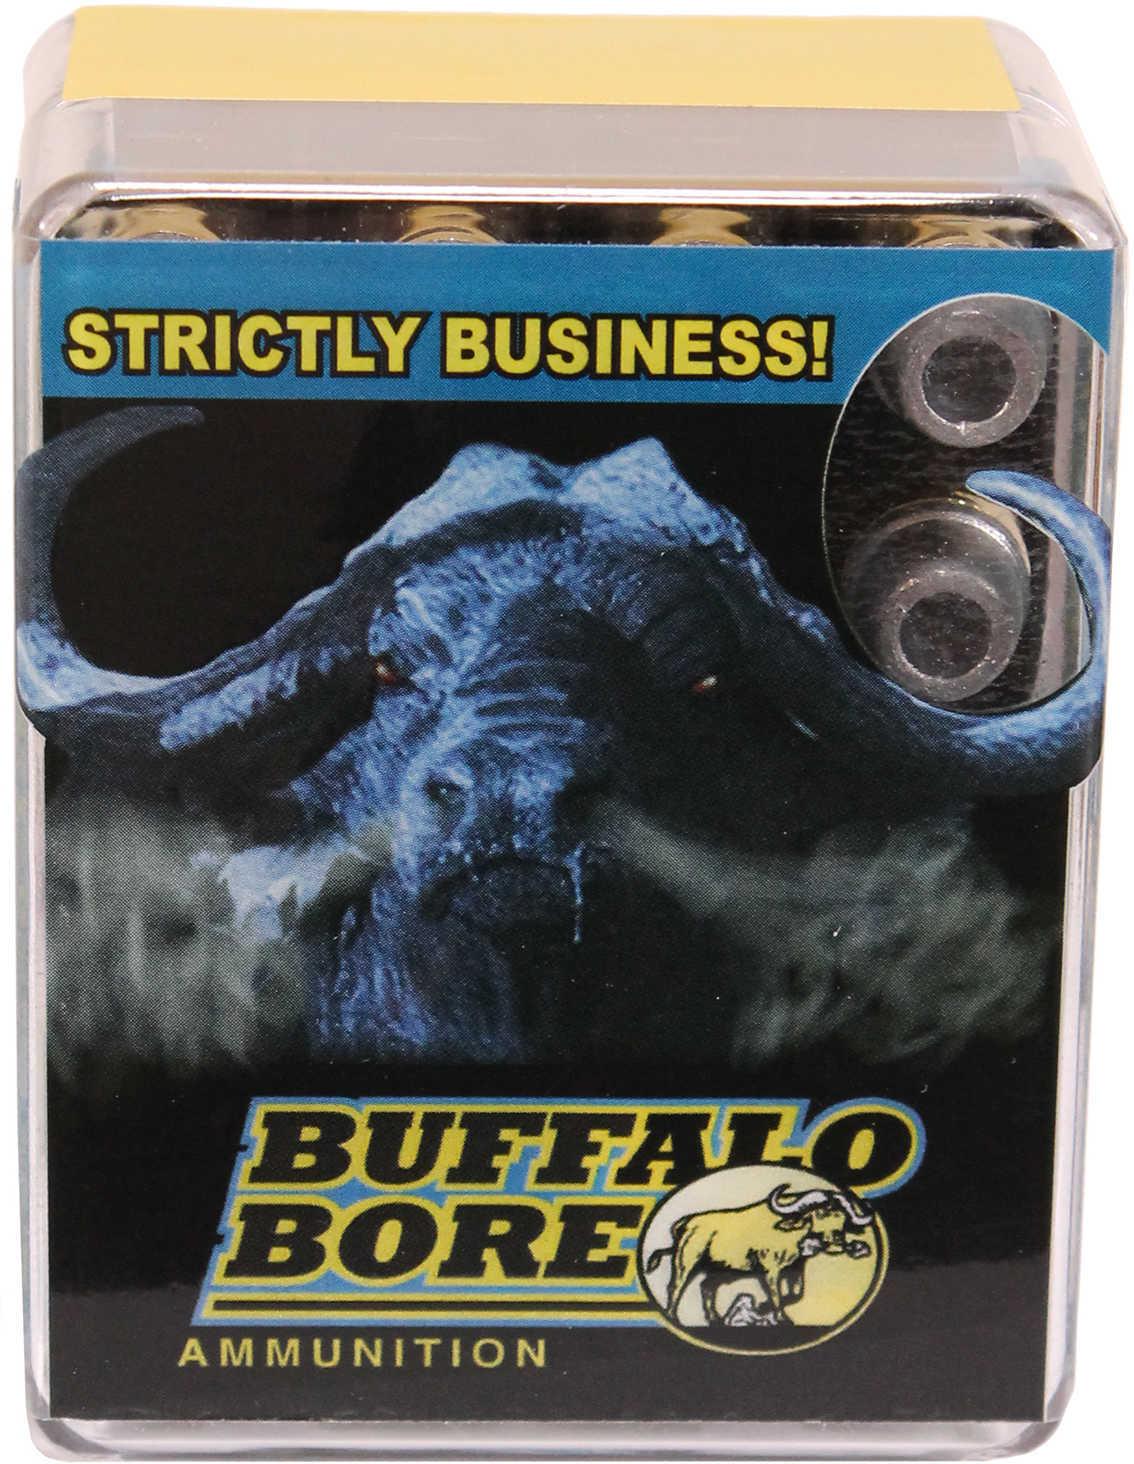 Buffalo Bore Ammunition .44-40 WCF, 185 Grains, Lead Hollow Point, Per 20